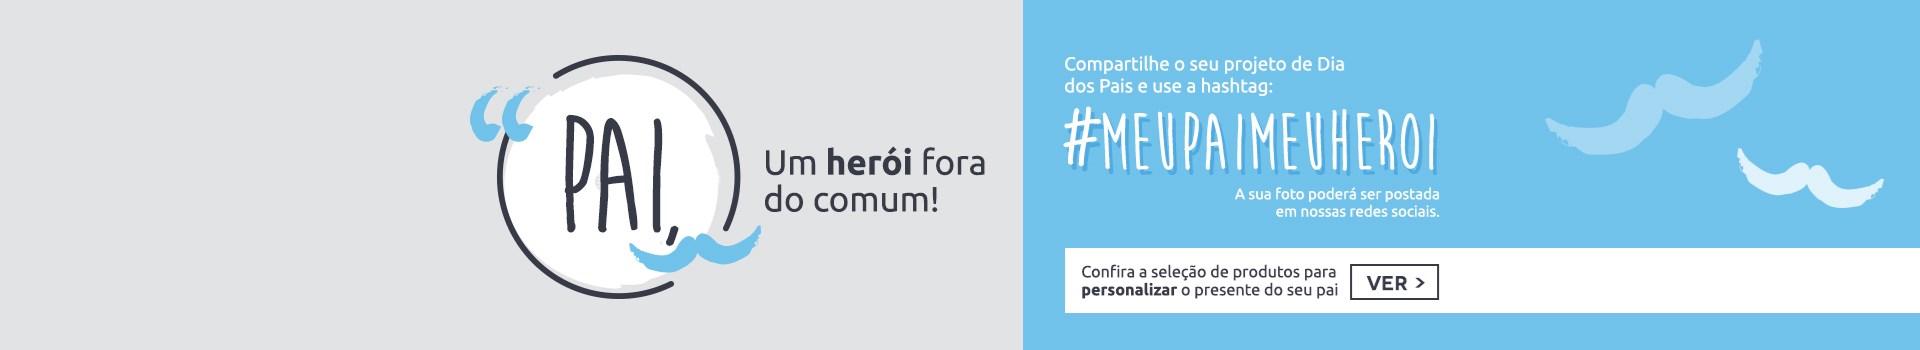 #meupaimeuherói